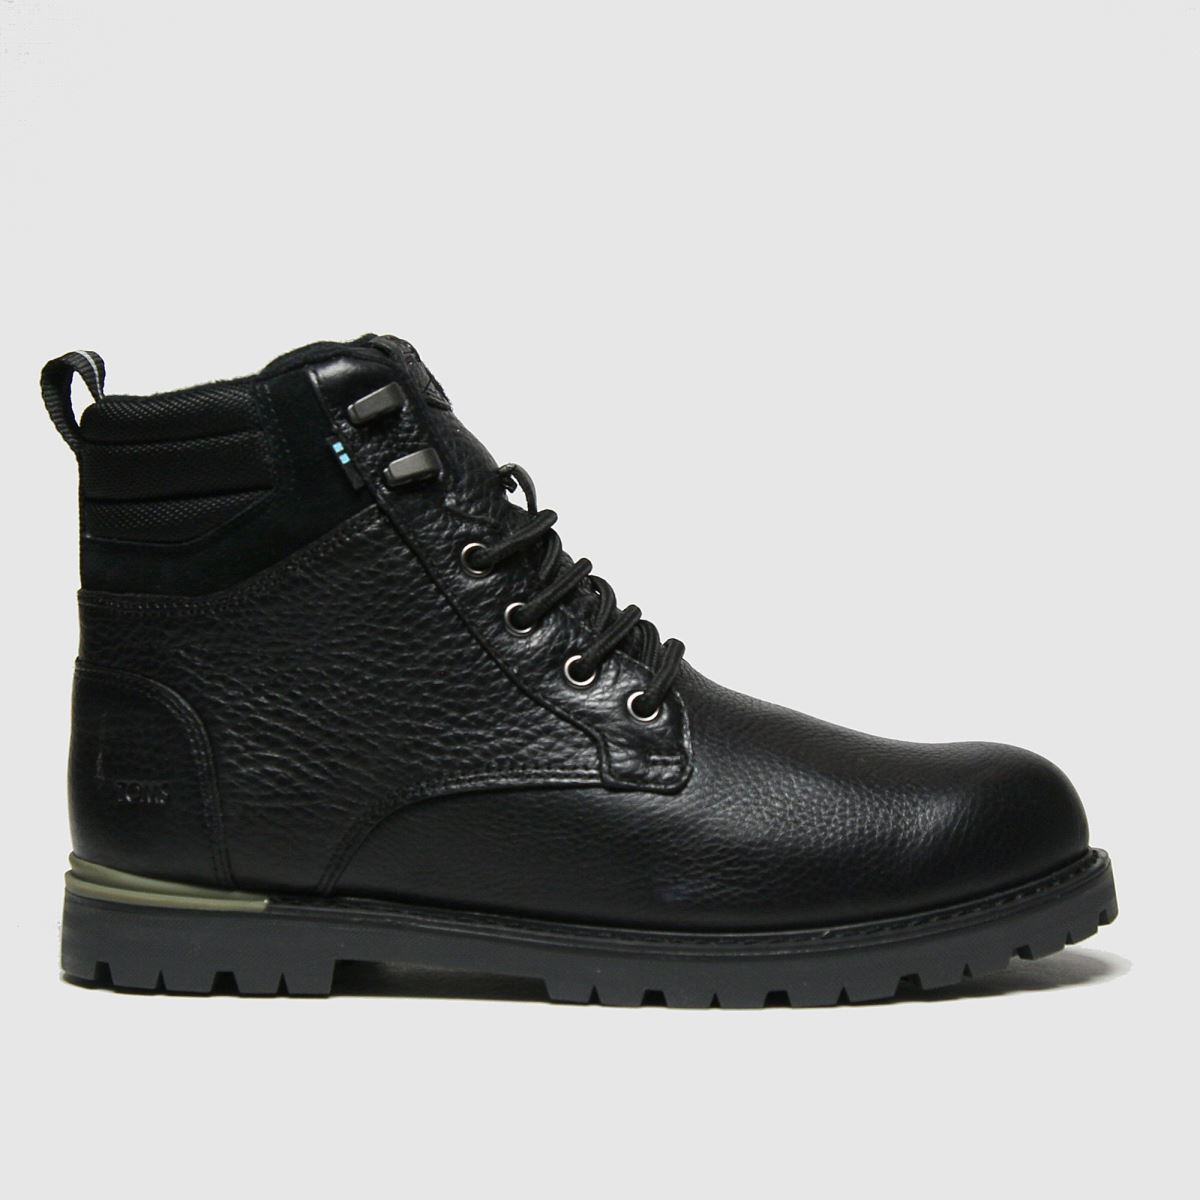 TOMS Black Ashland 2.0 Boots